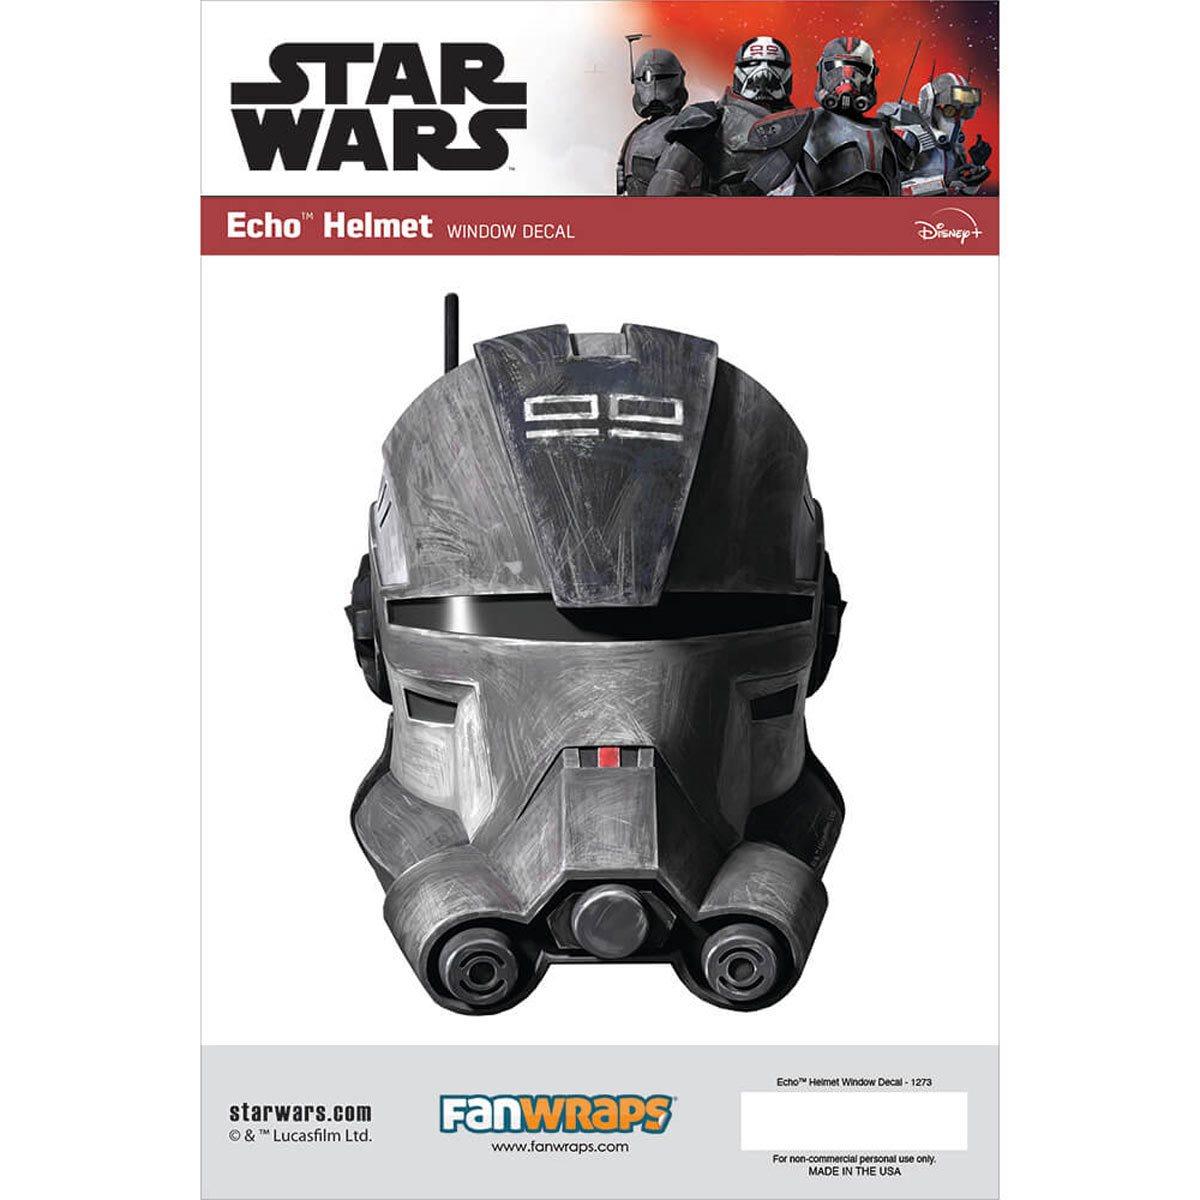 Star Wars Echo Helmet Window Decal画像